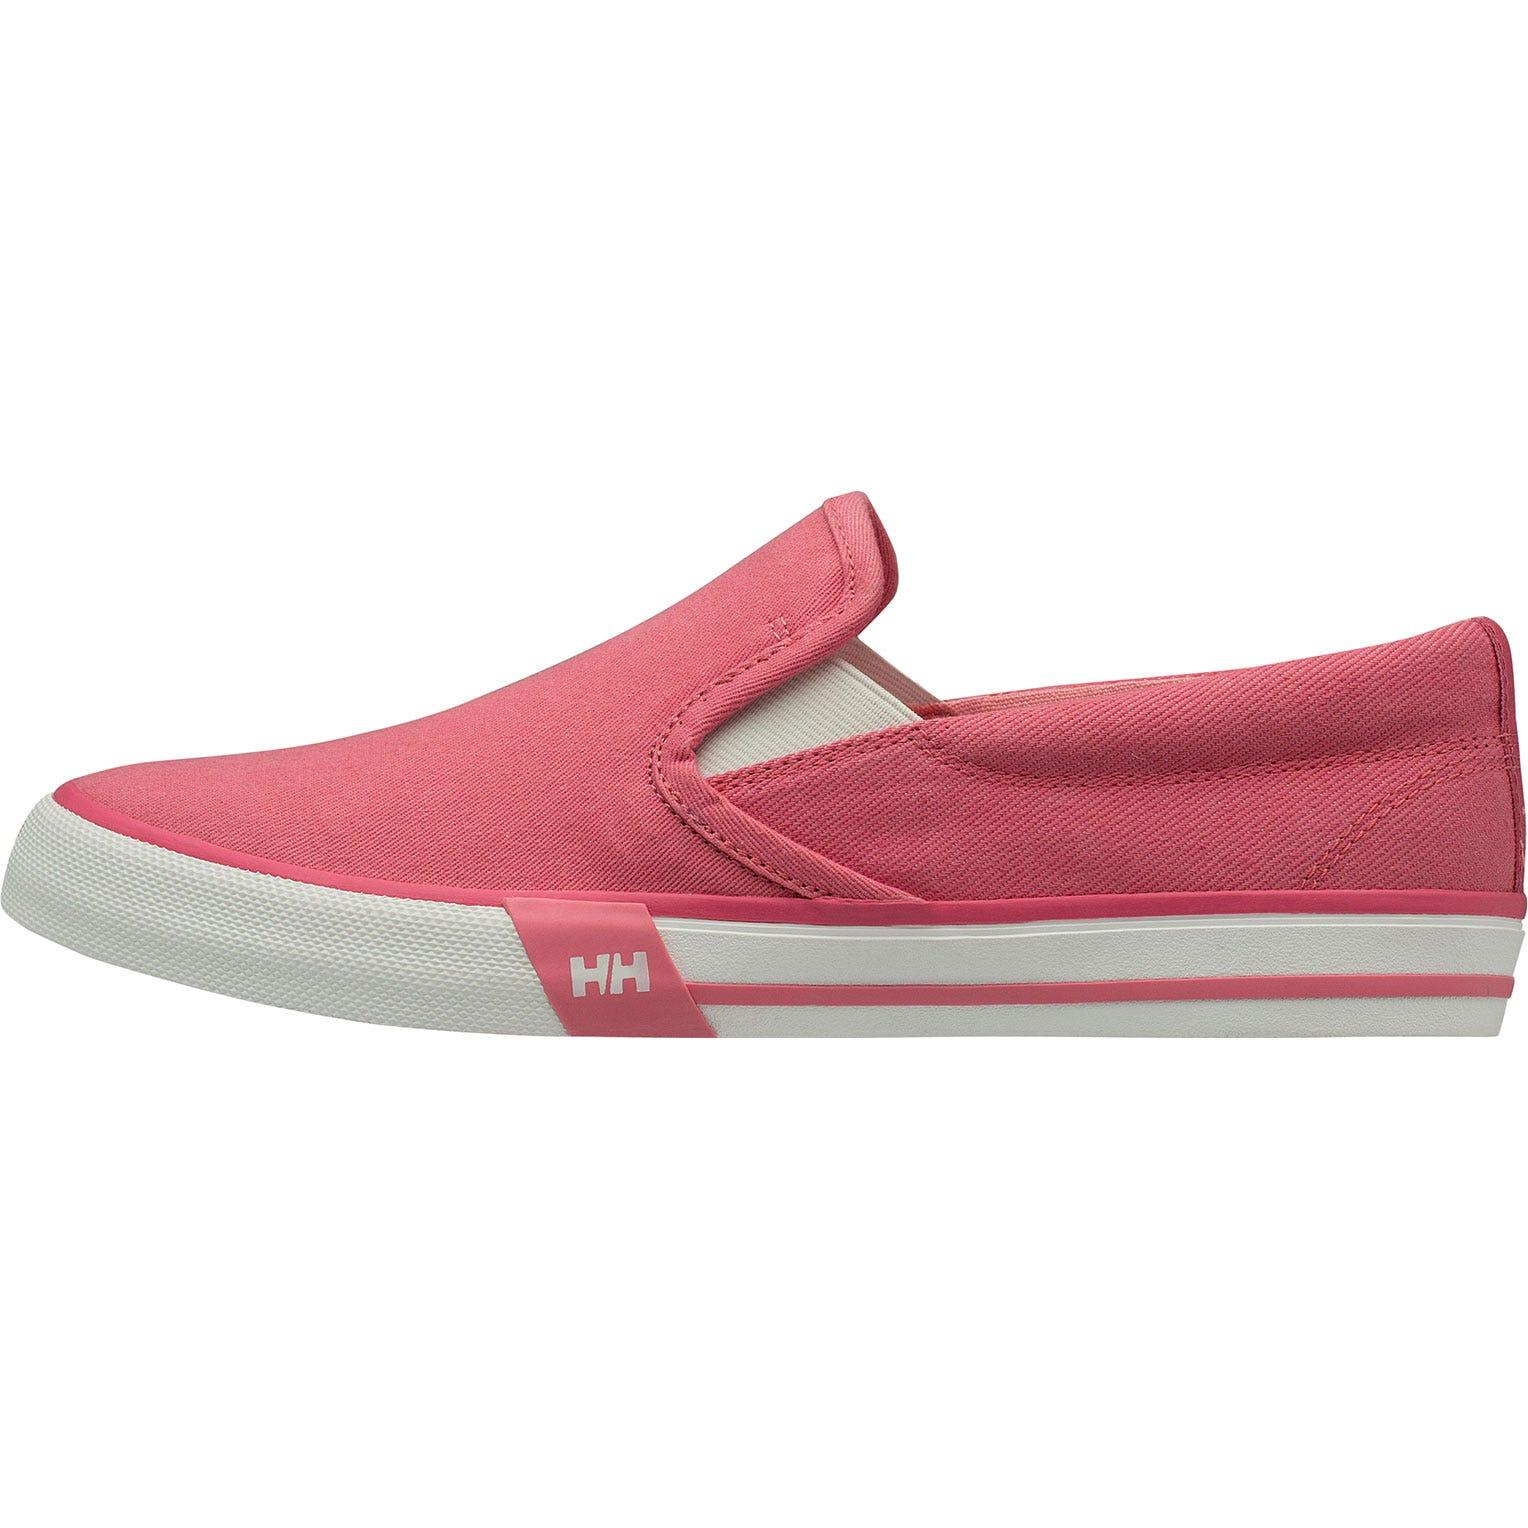 Helly Hansen W Copenhagen Slipon Shoe Womens Casual Pink 36/5.5